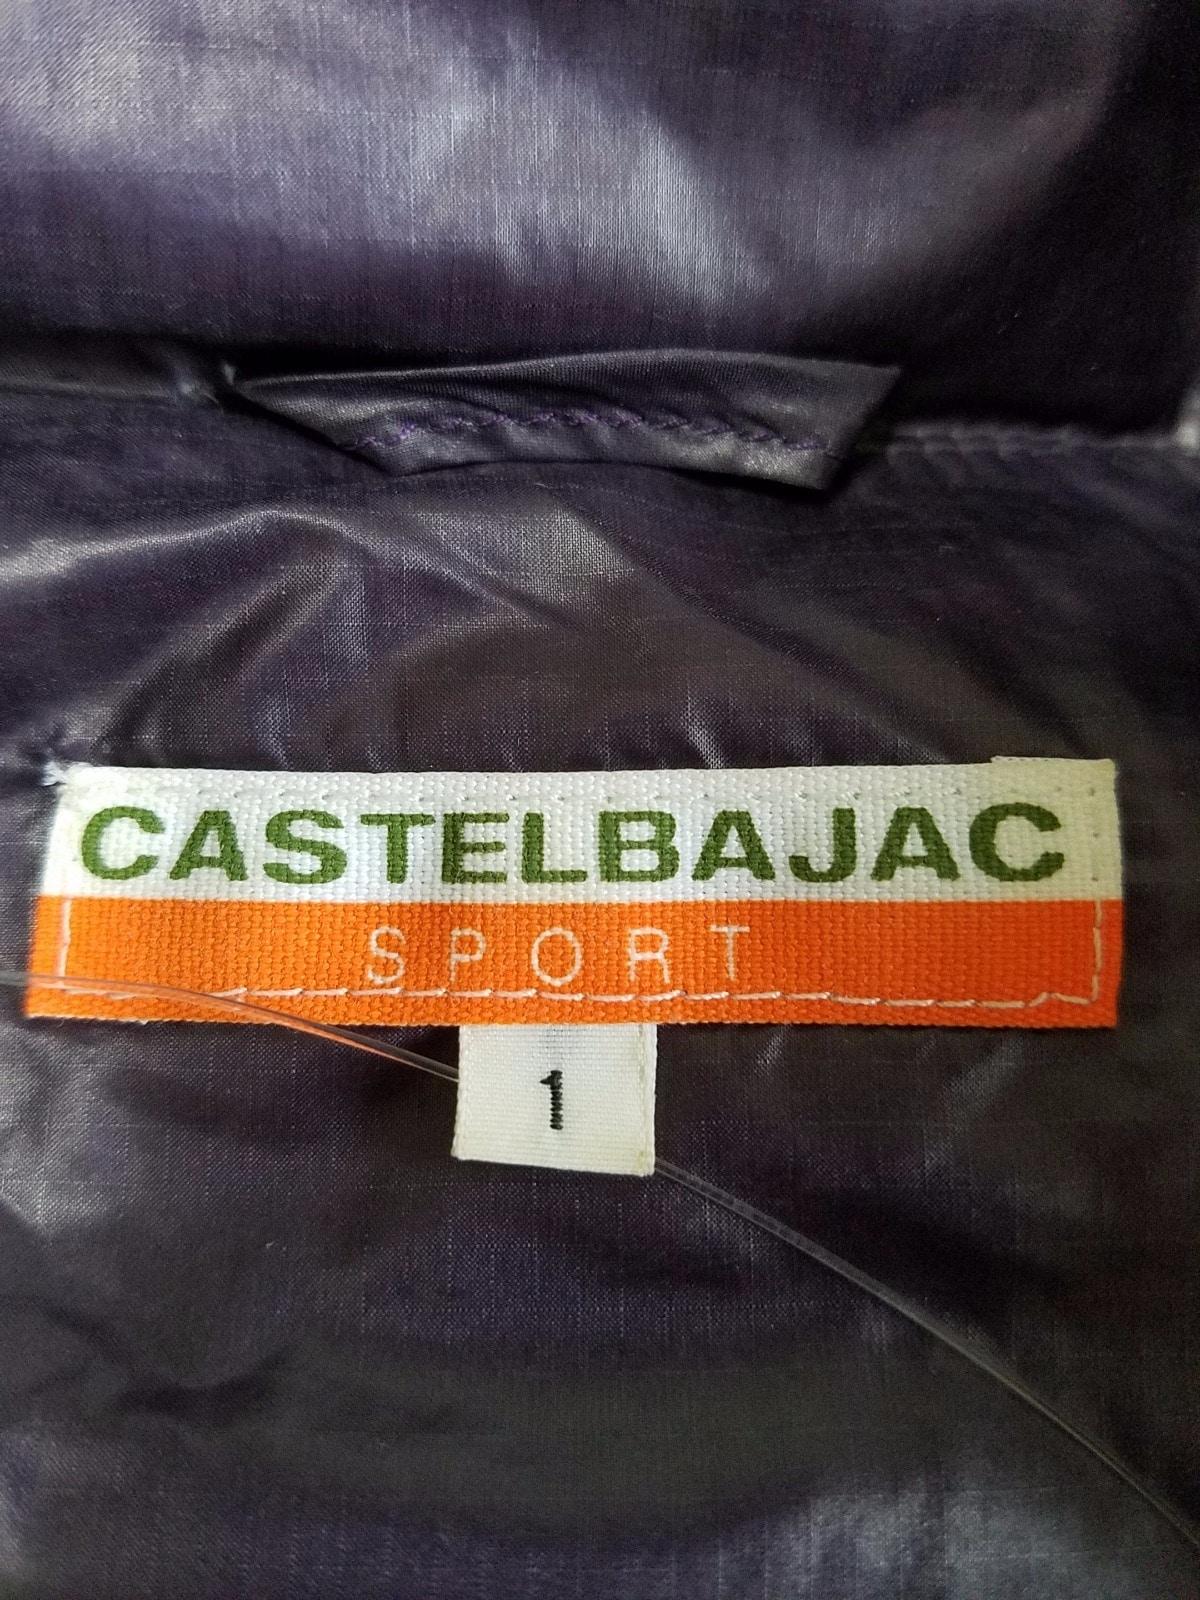 CastelbajacSport(カステルバジャックスポーツ)のダウンジャケット